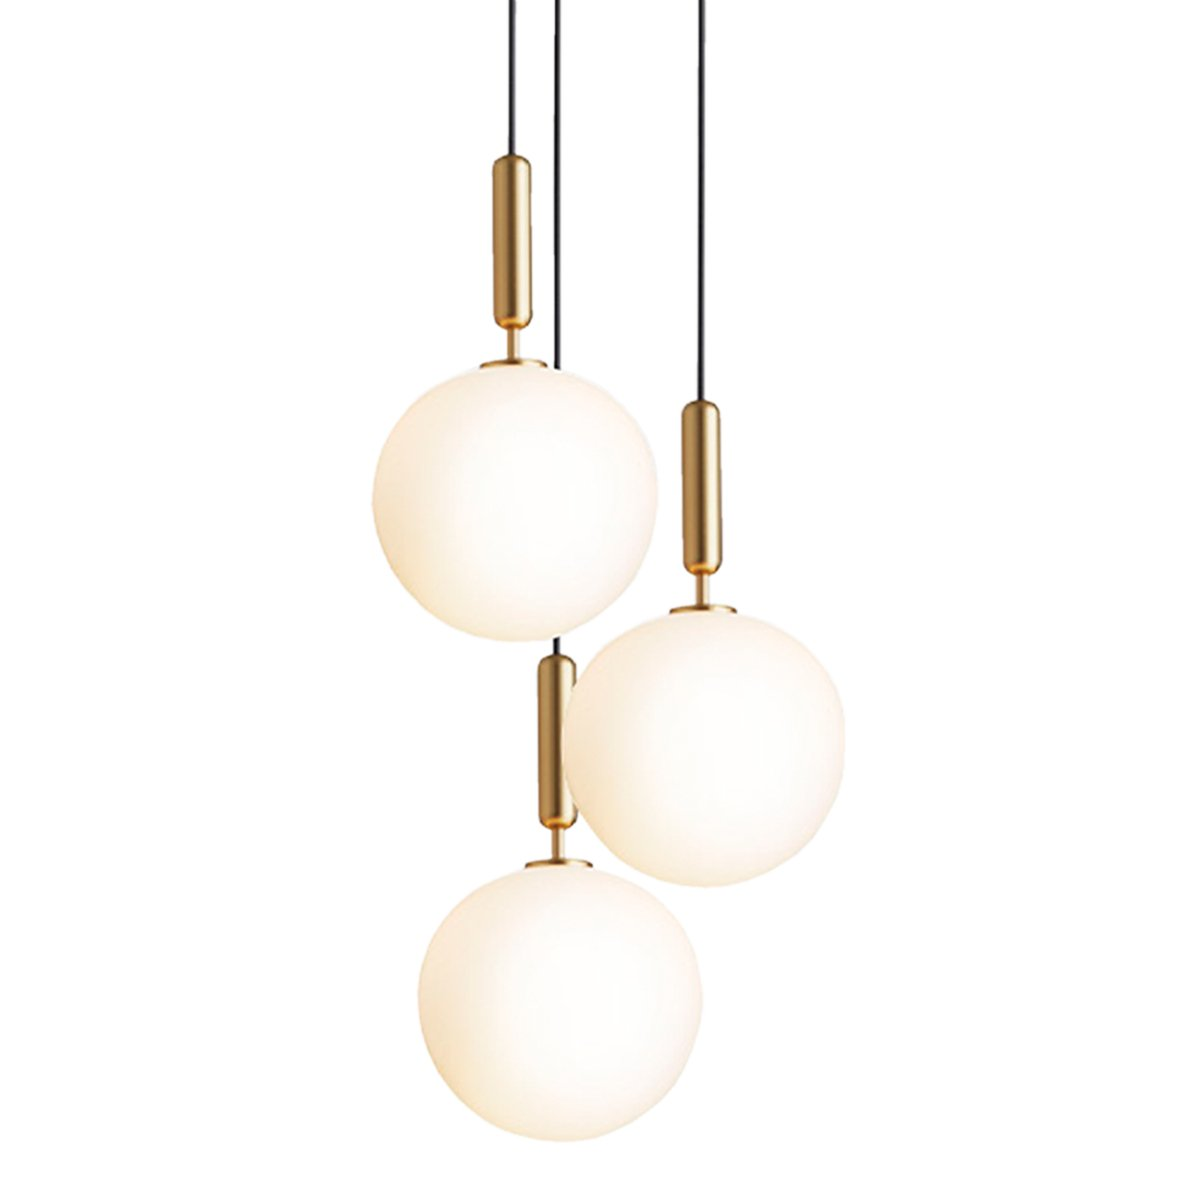 Nuura Miira 3 Hanglamp Large - Brass / Opal